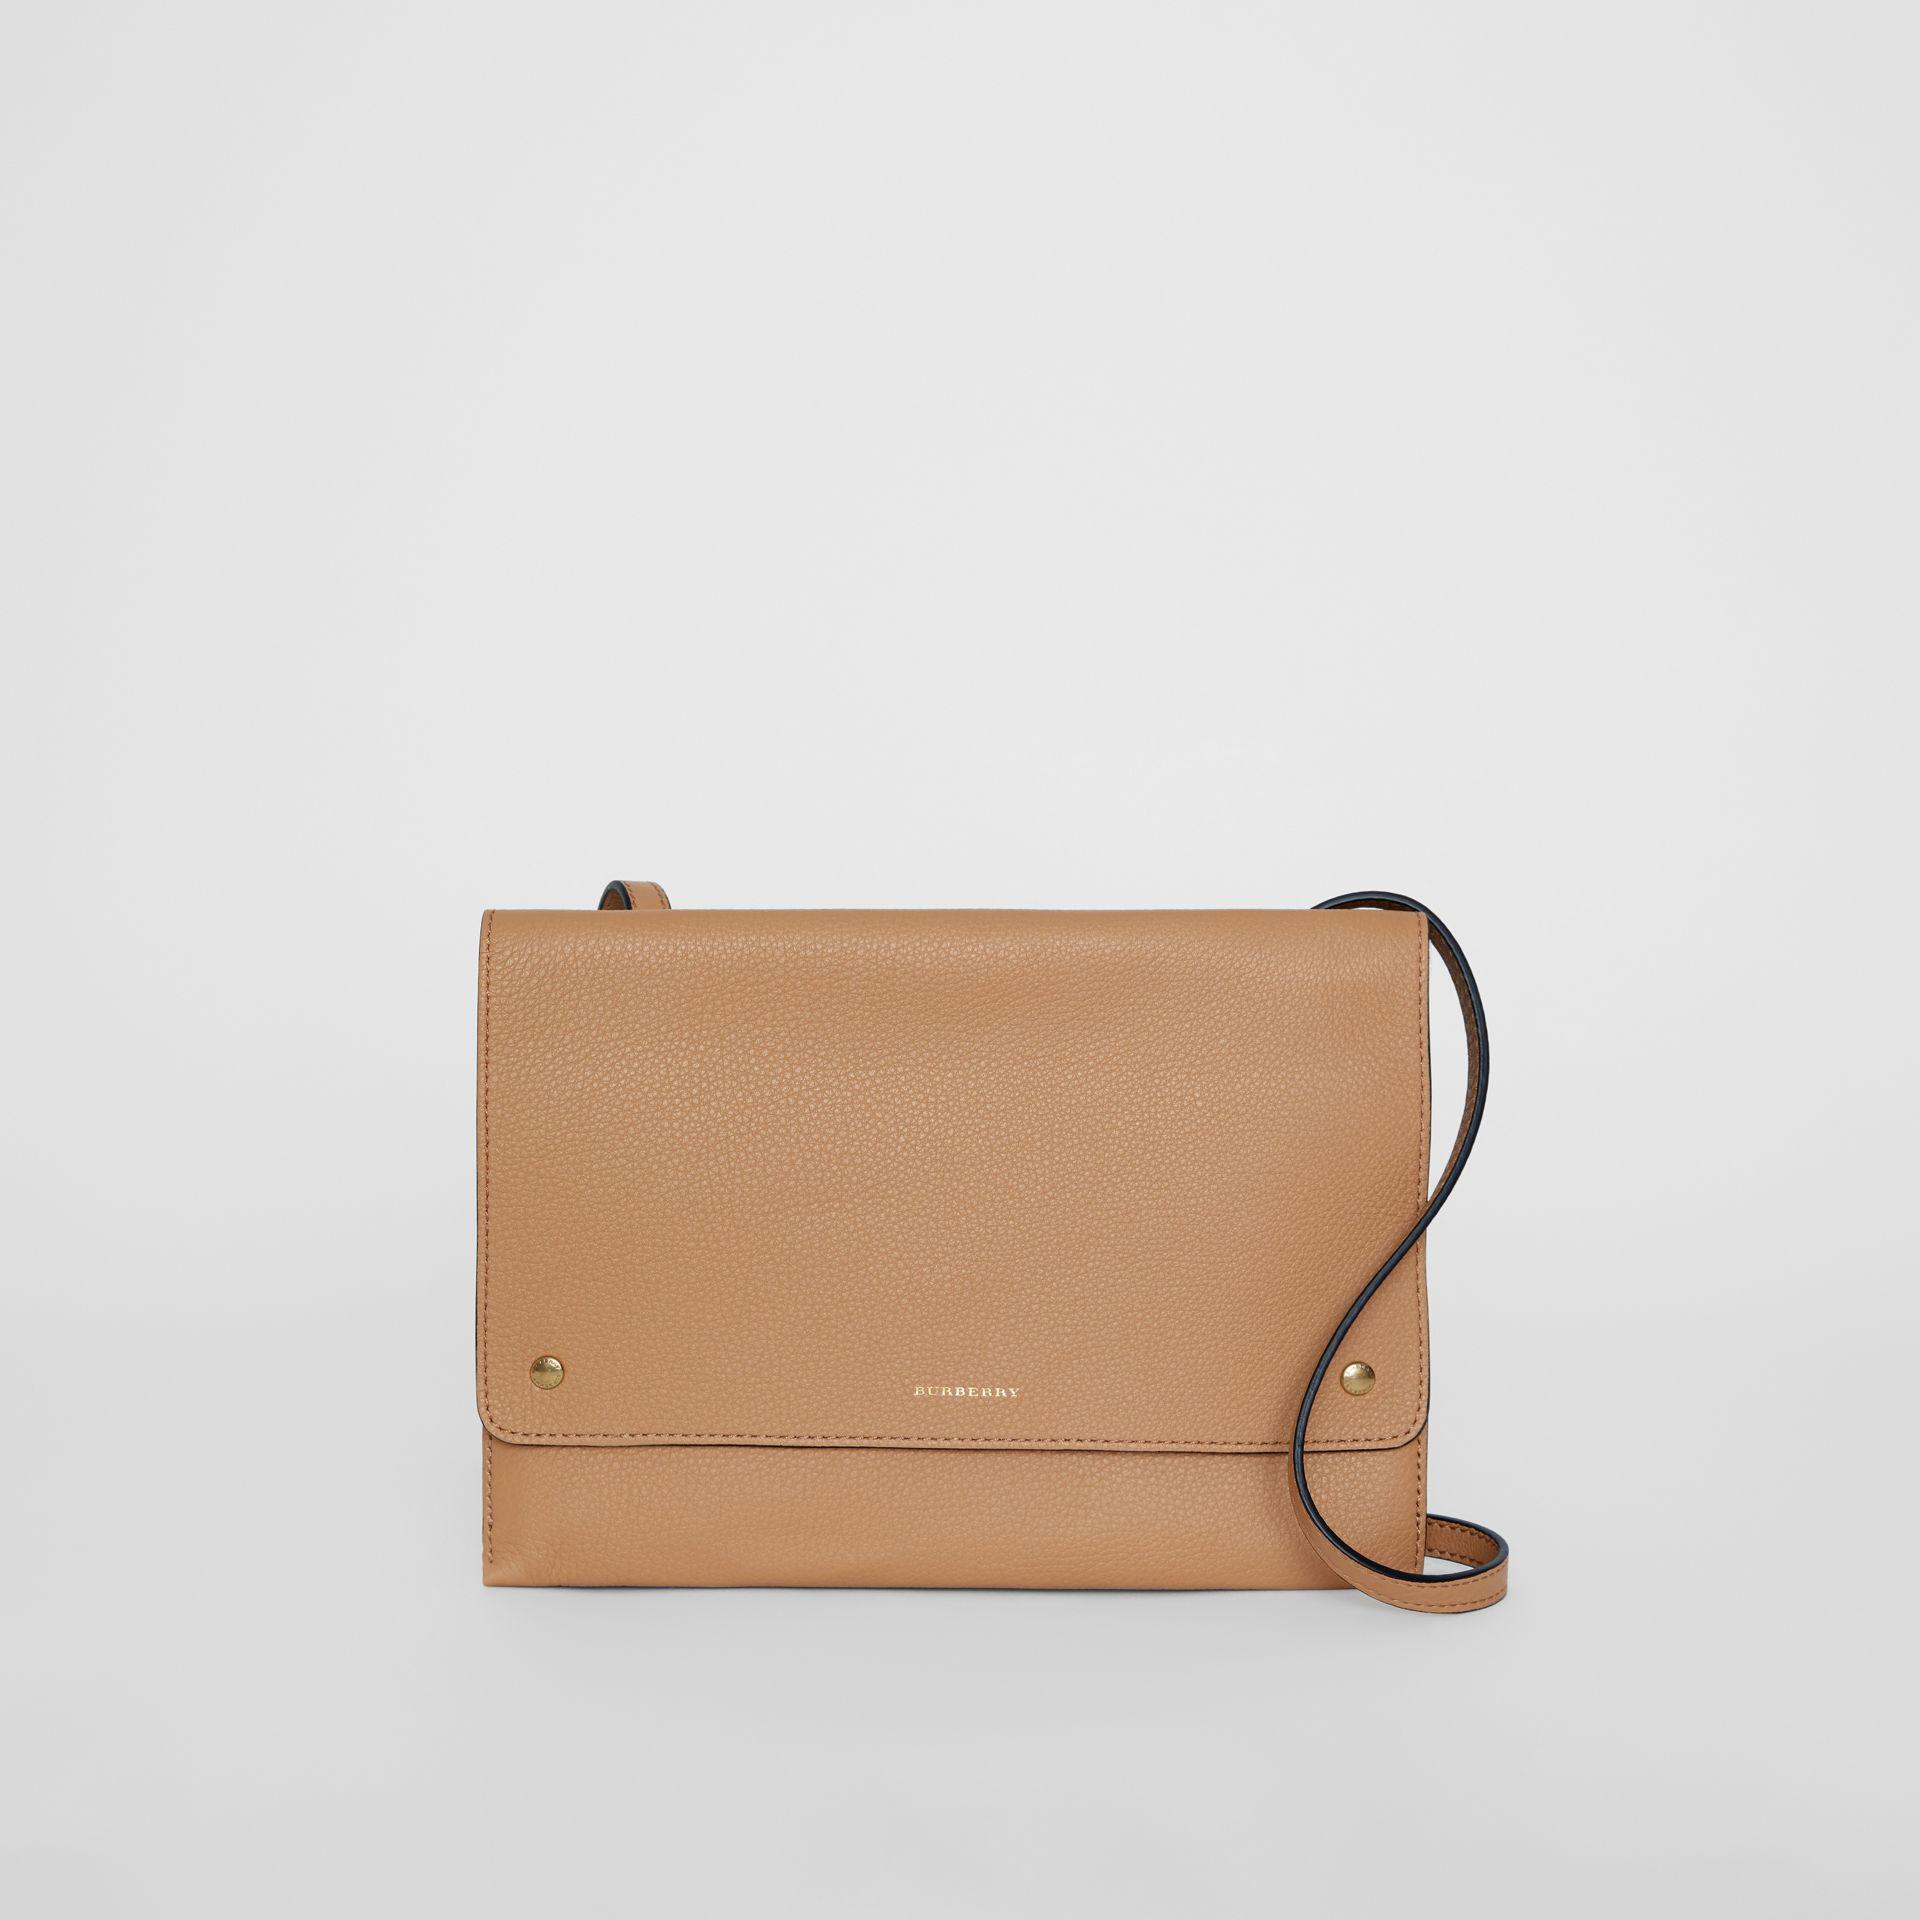 Lyst - Burberry Leather Envelope Crossbody Bag 38feda397b